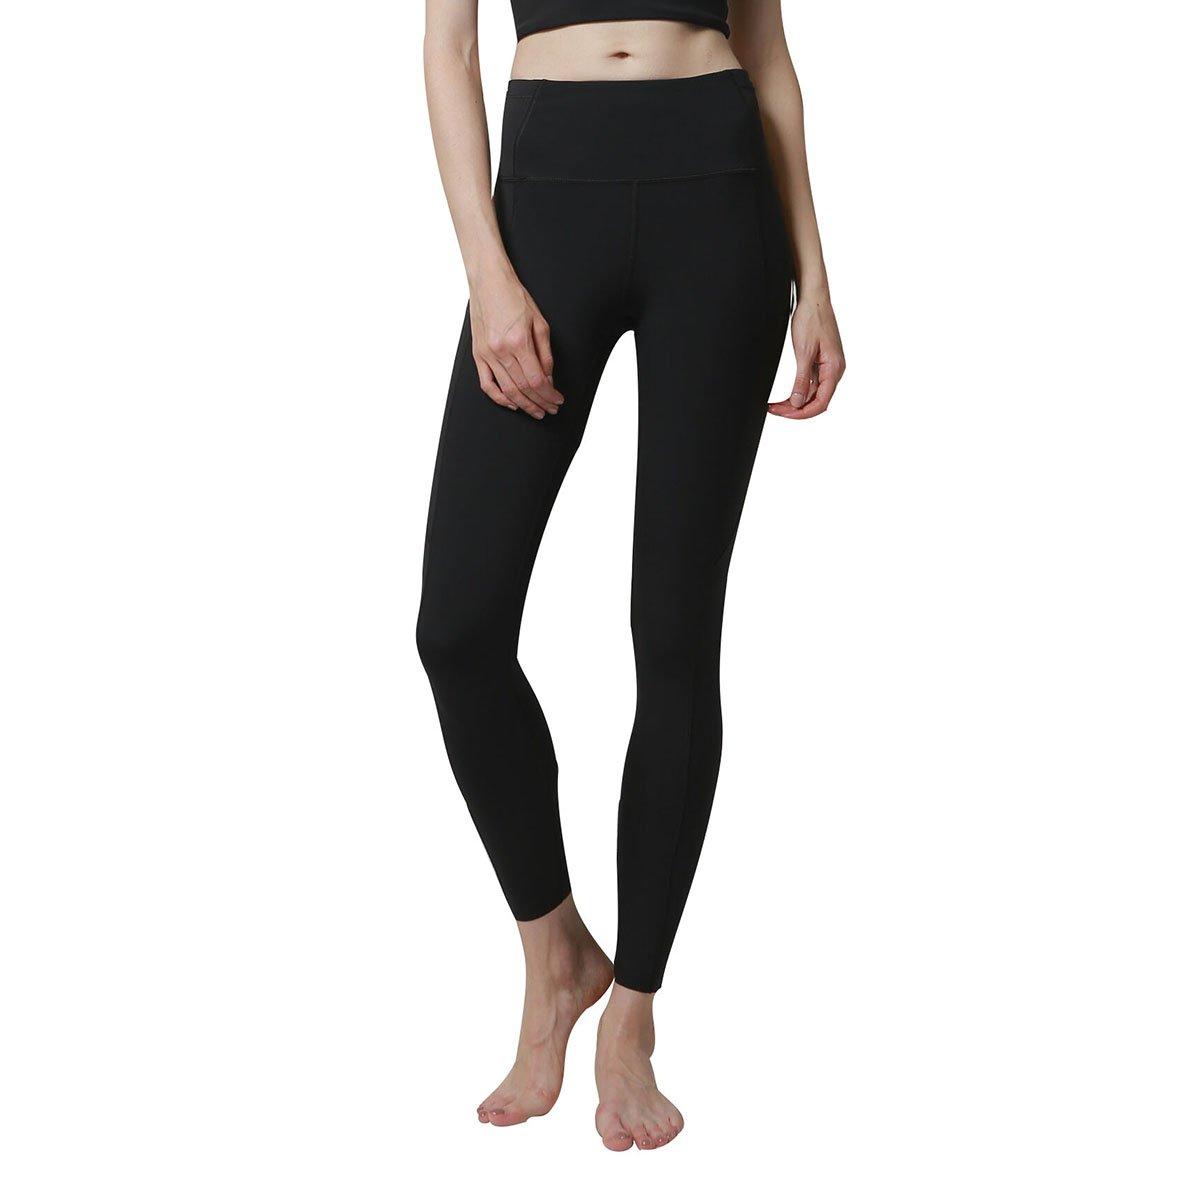 Beepeak Women's High Waist Non See-through Slim Gym Pants Workout Leggings